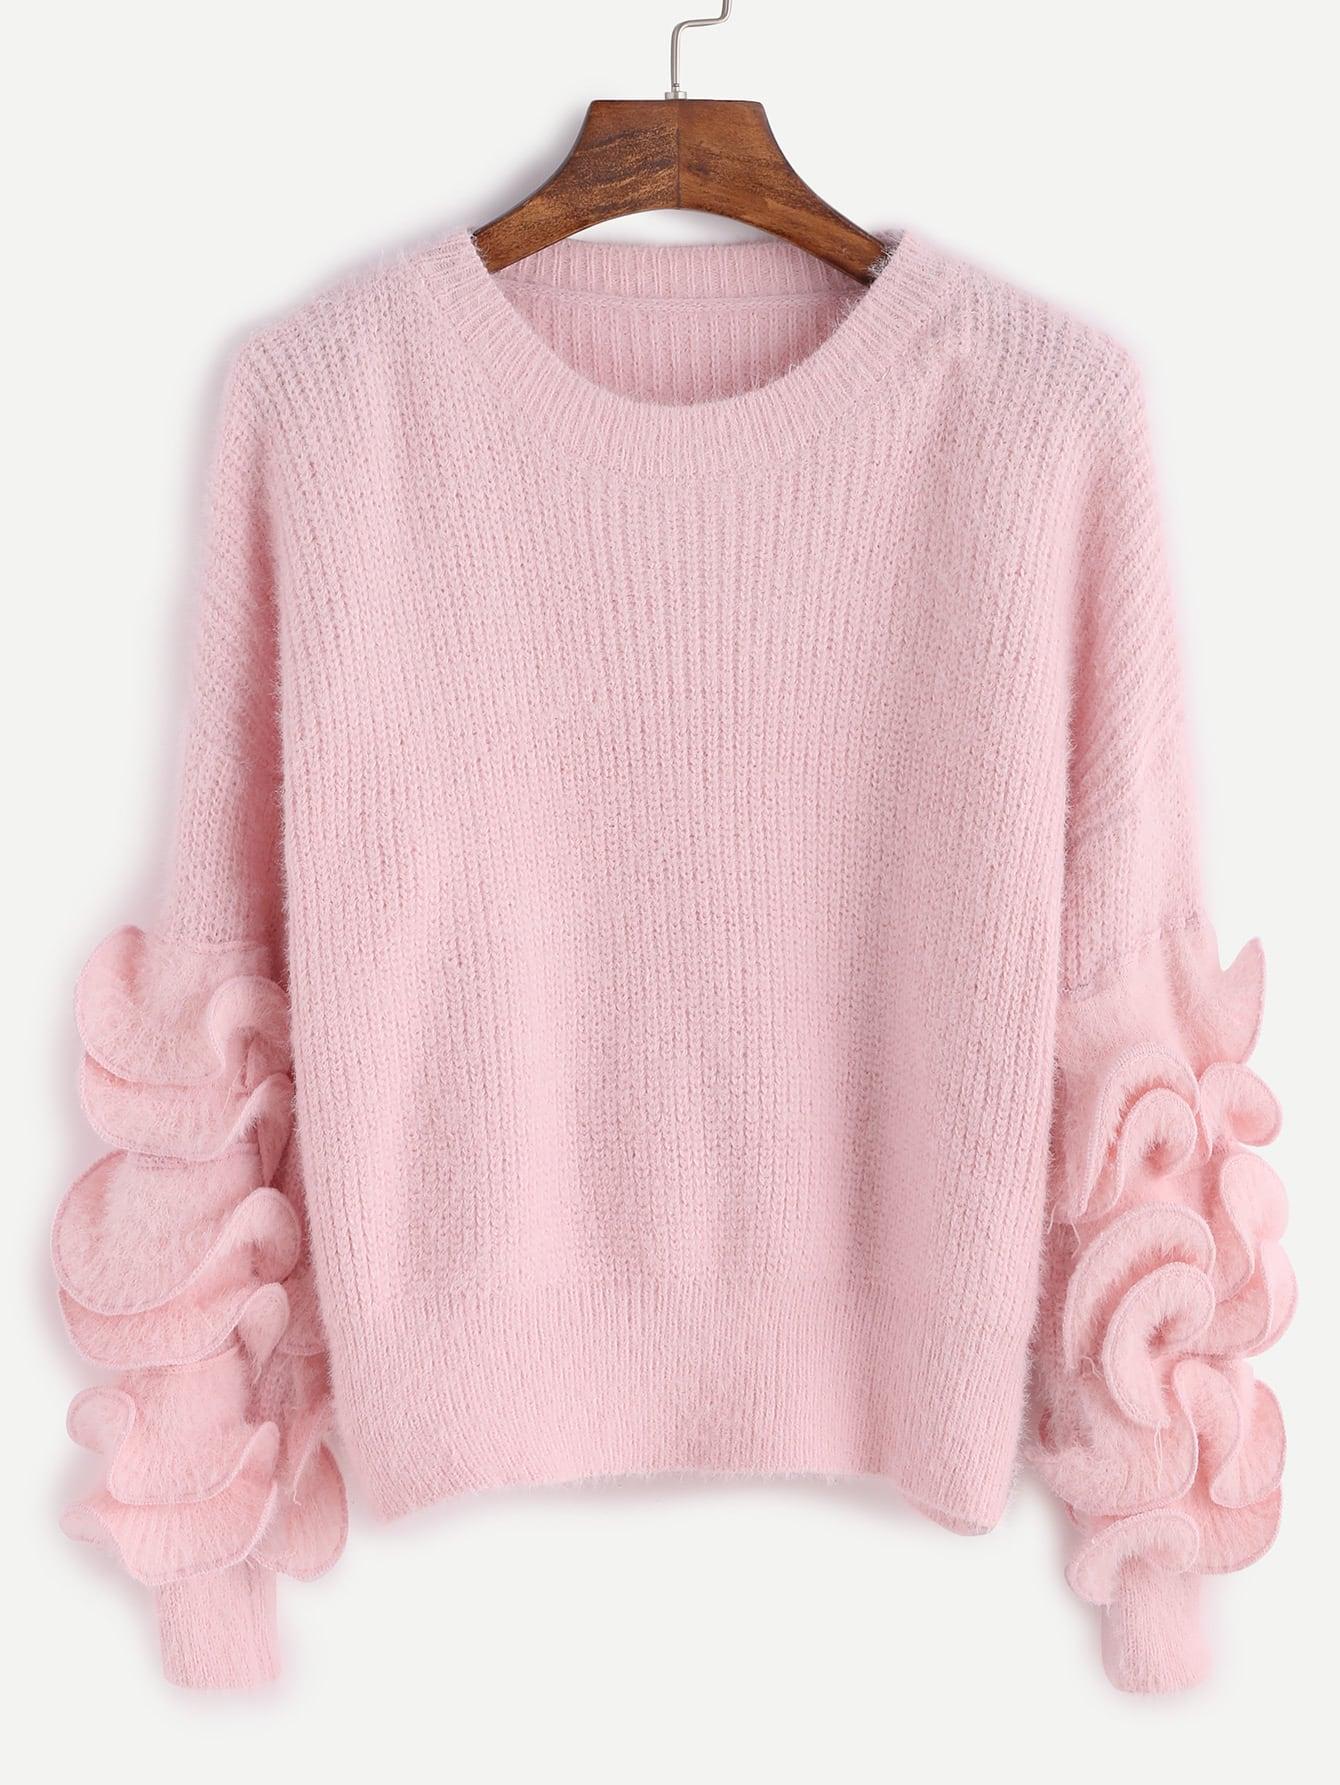 sweater161017105_2